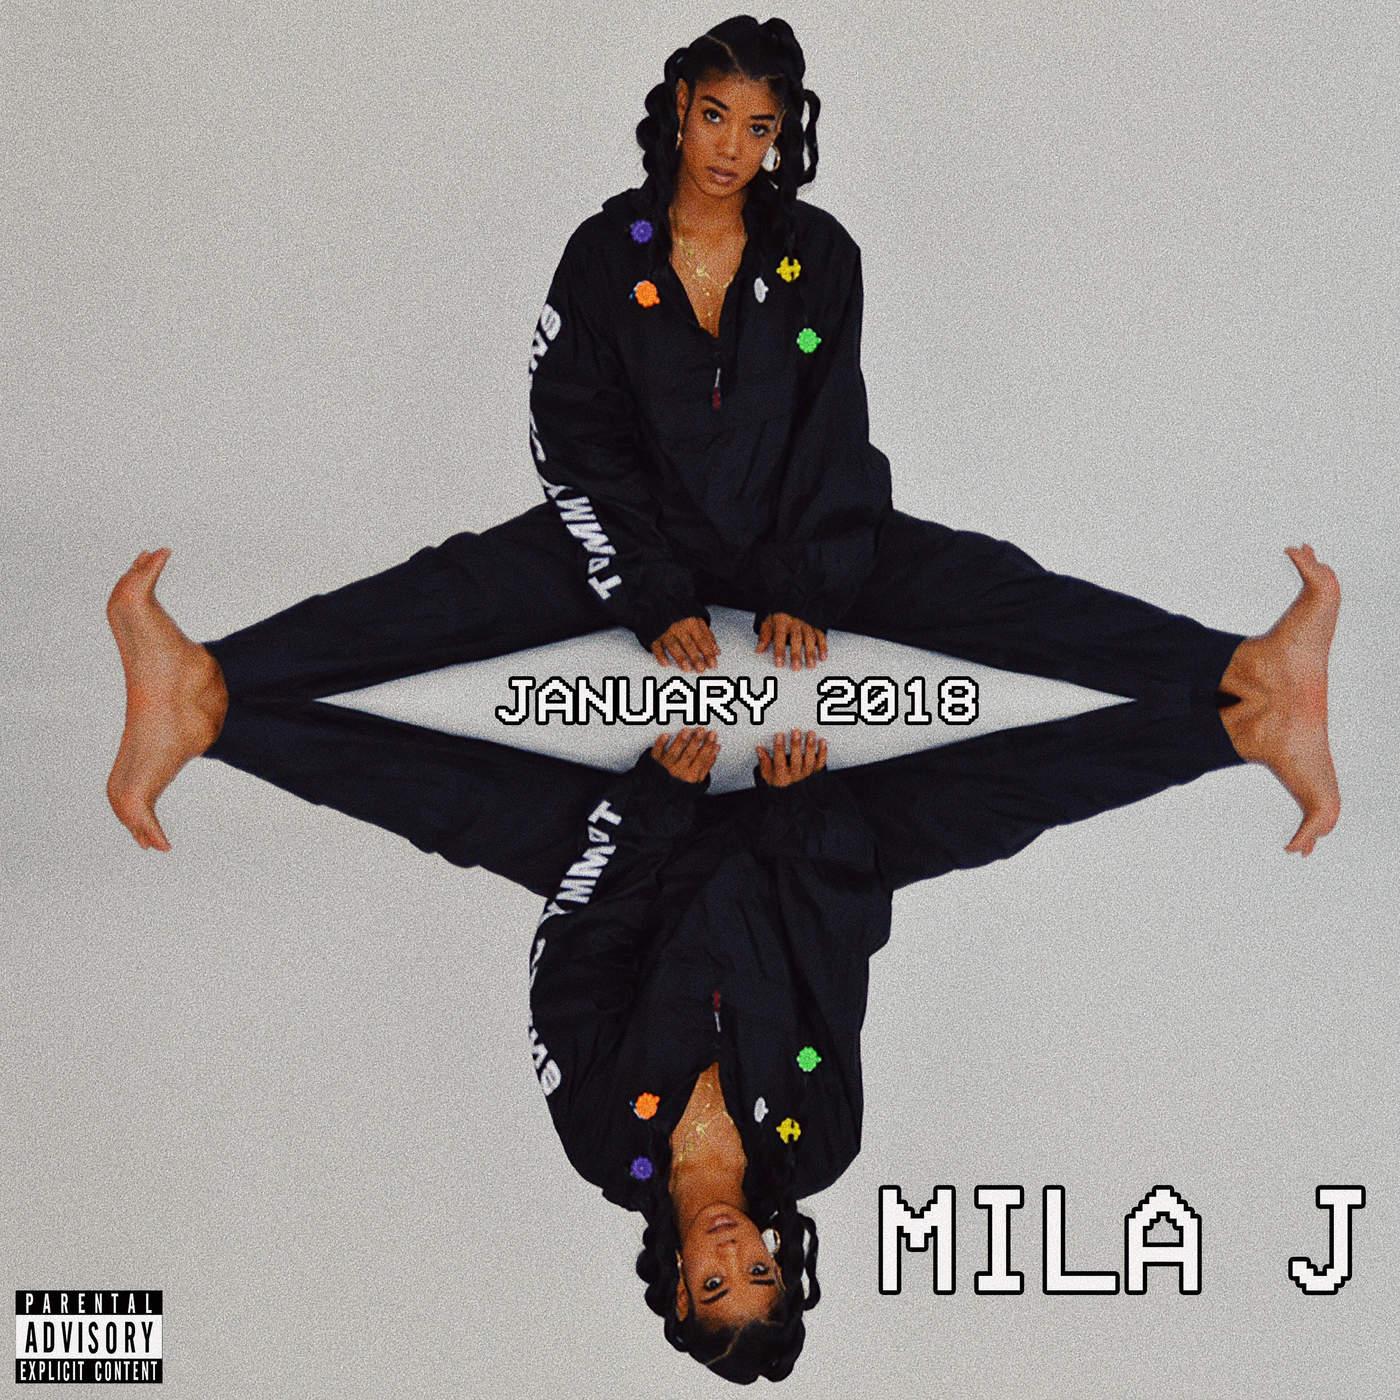 Mila J - January 2018 - EP Cover